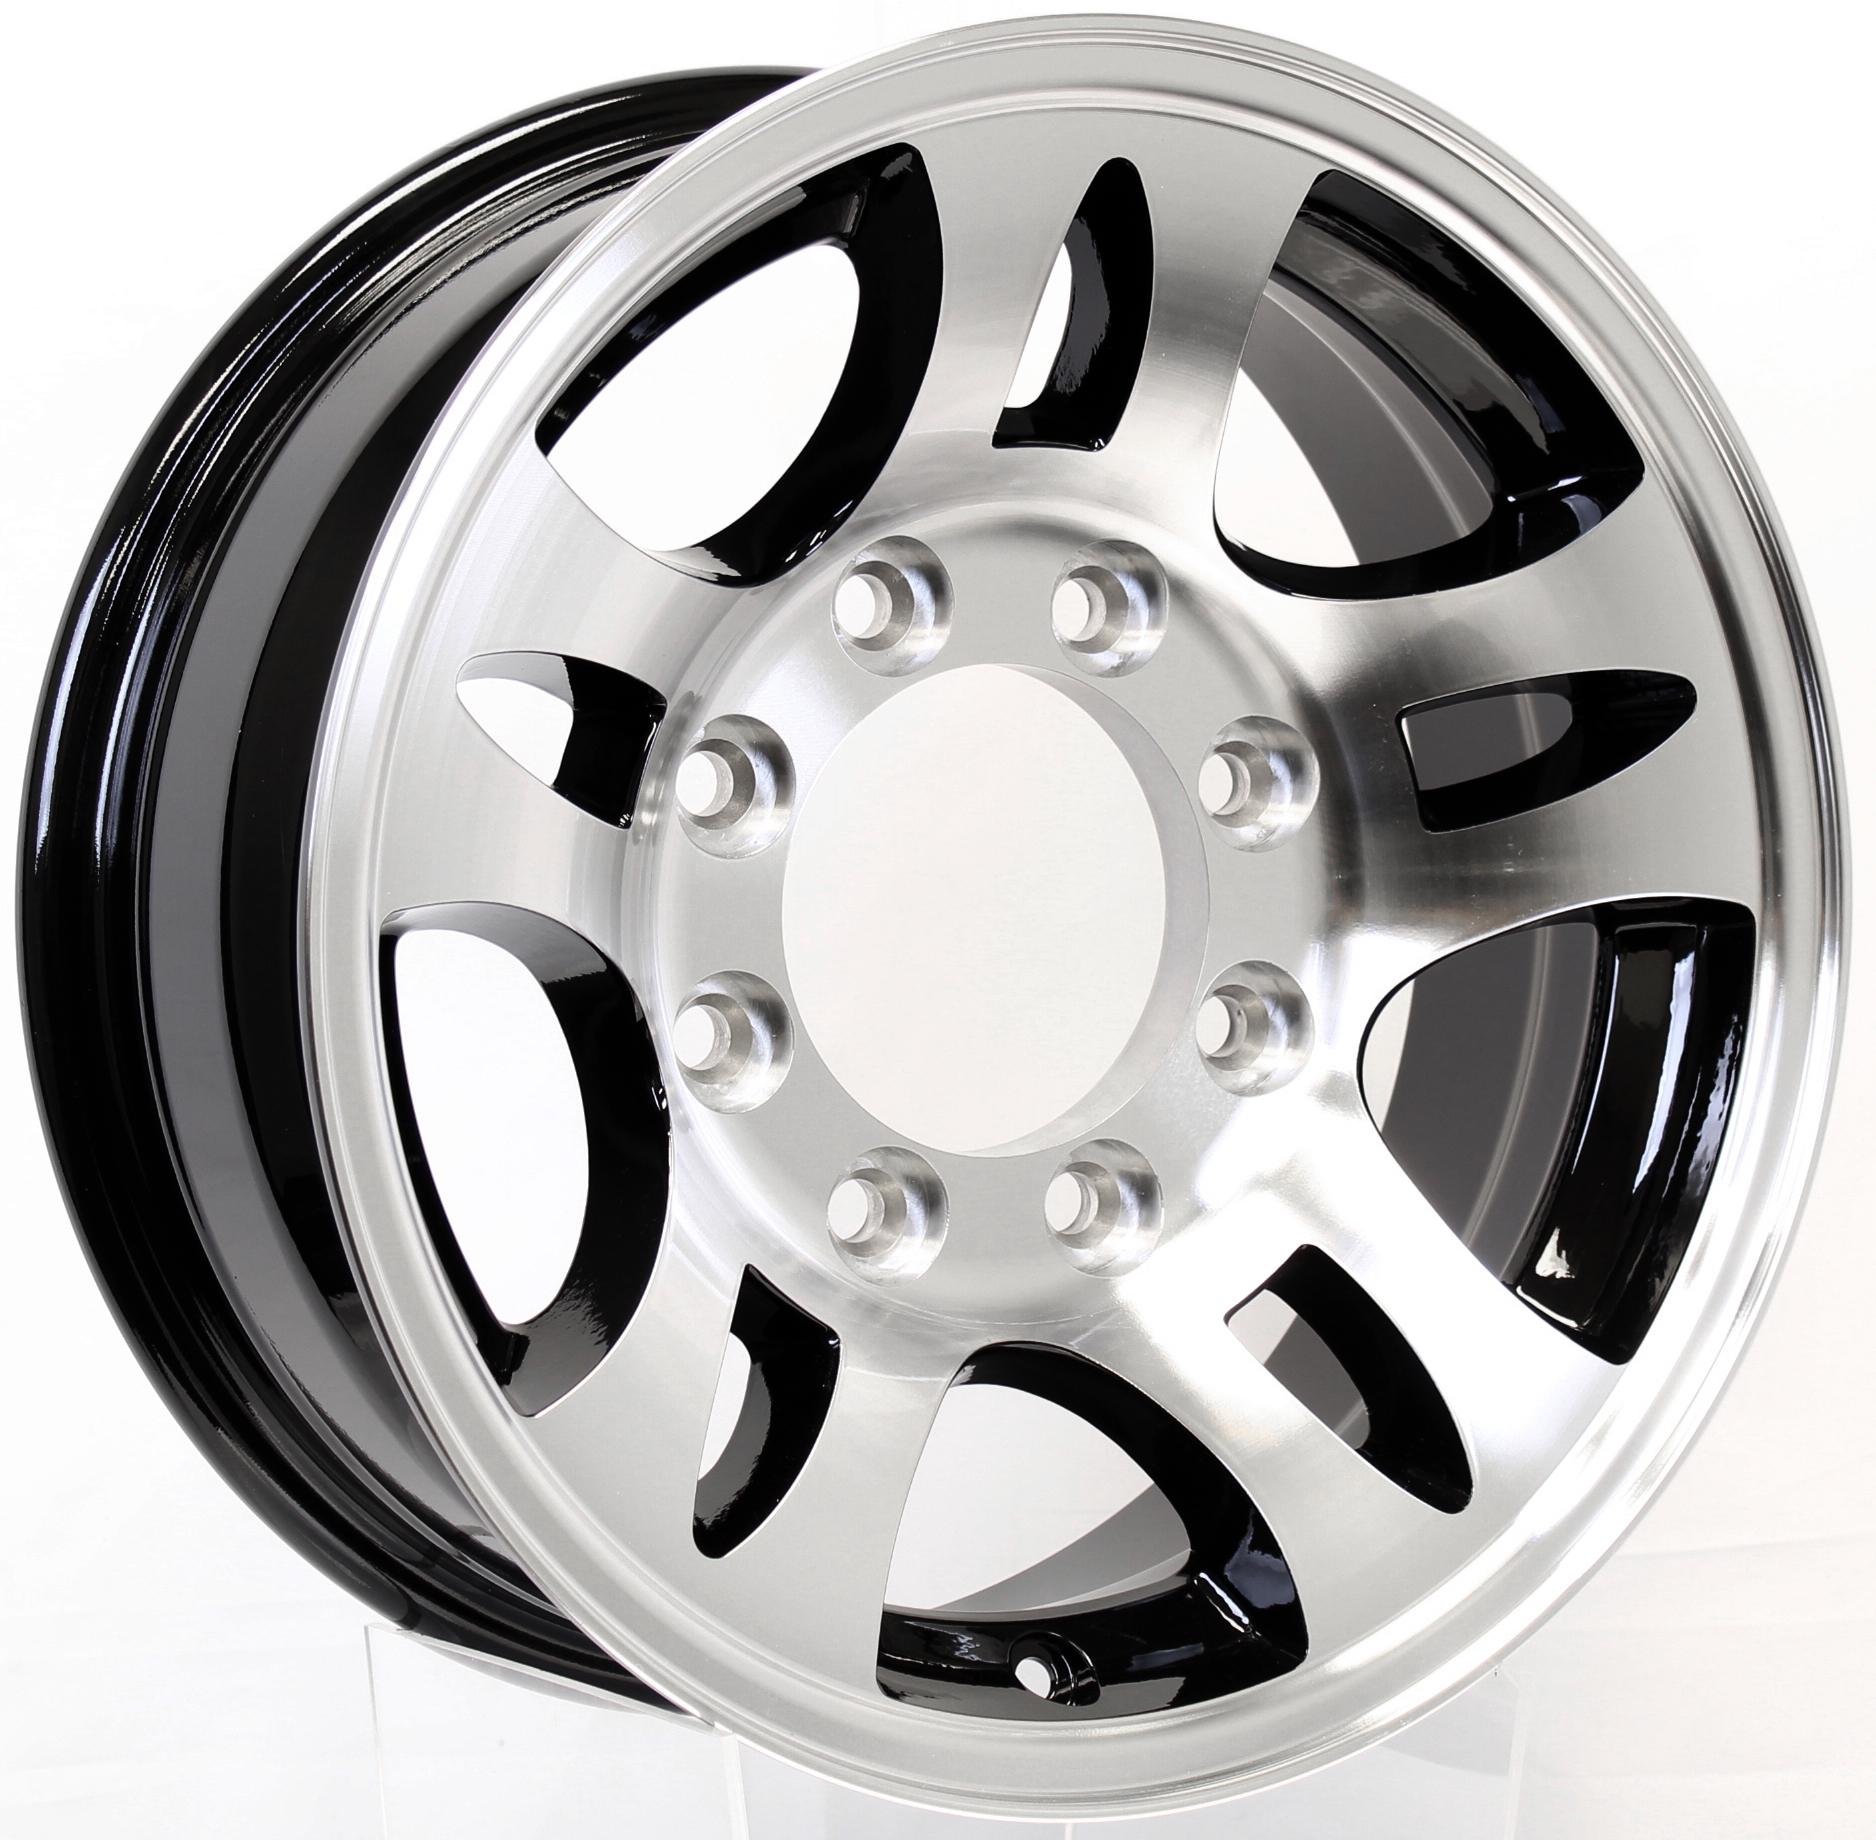 T03- 16x6 8-6.5 Black Inlay Aluminum Trailer Wheel  Image